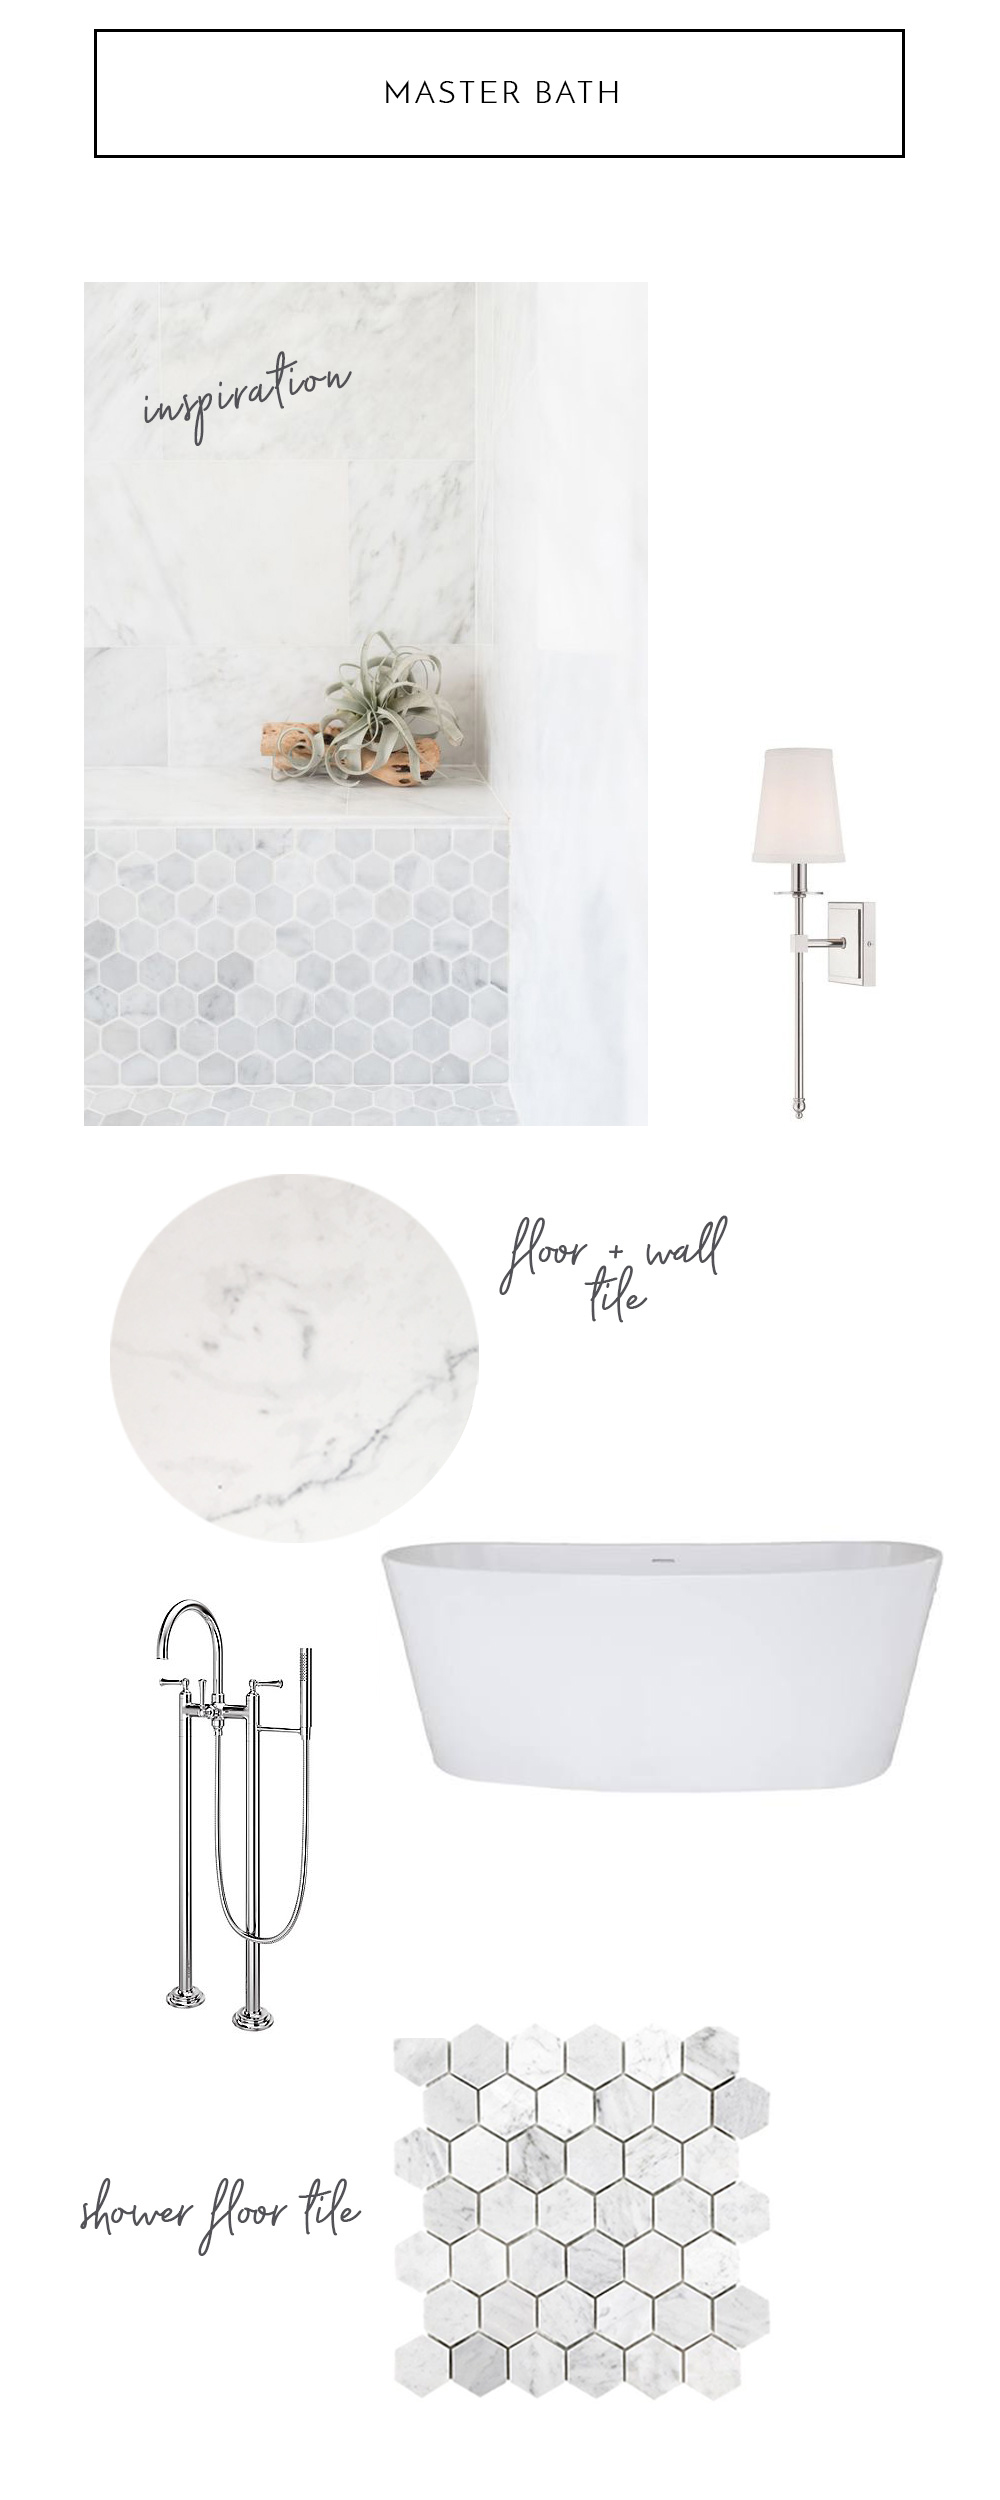 Blue Door Living Master Bath Design Plan